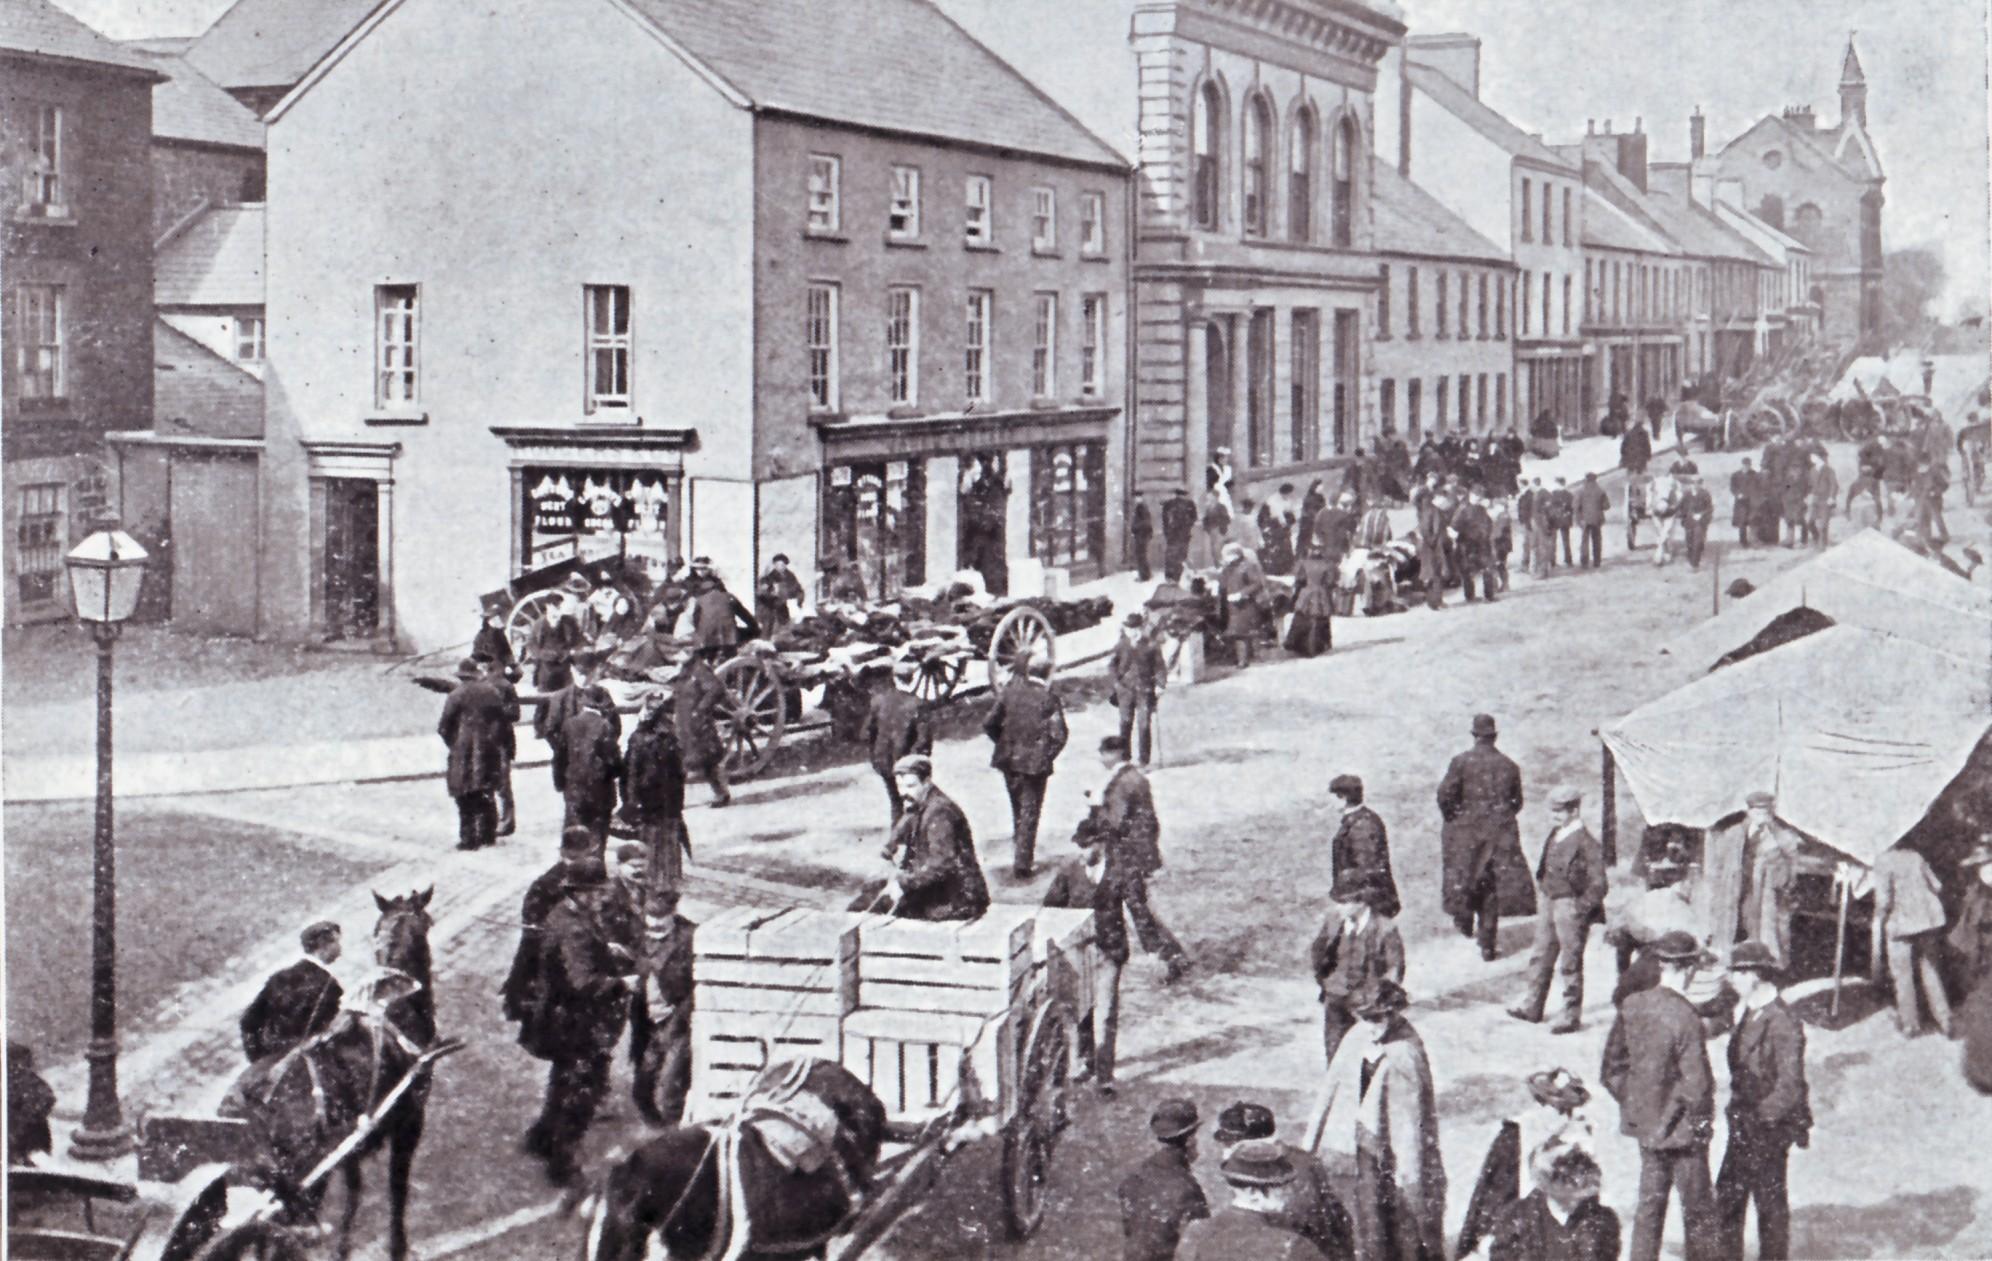 Ballymoney High Street on market day